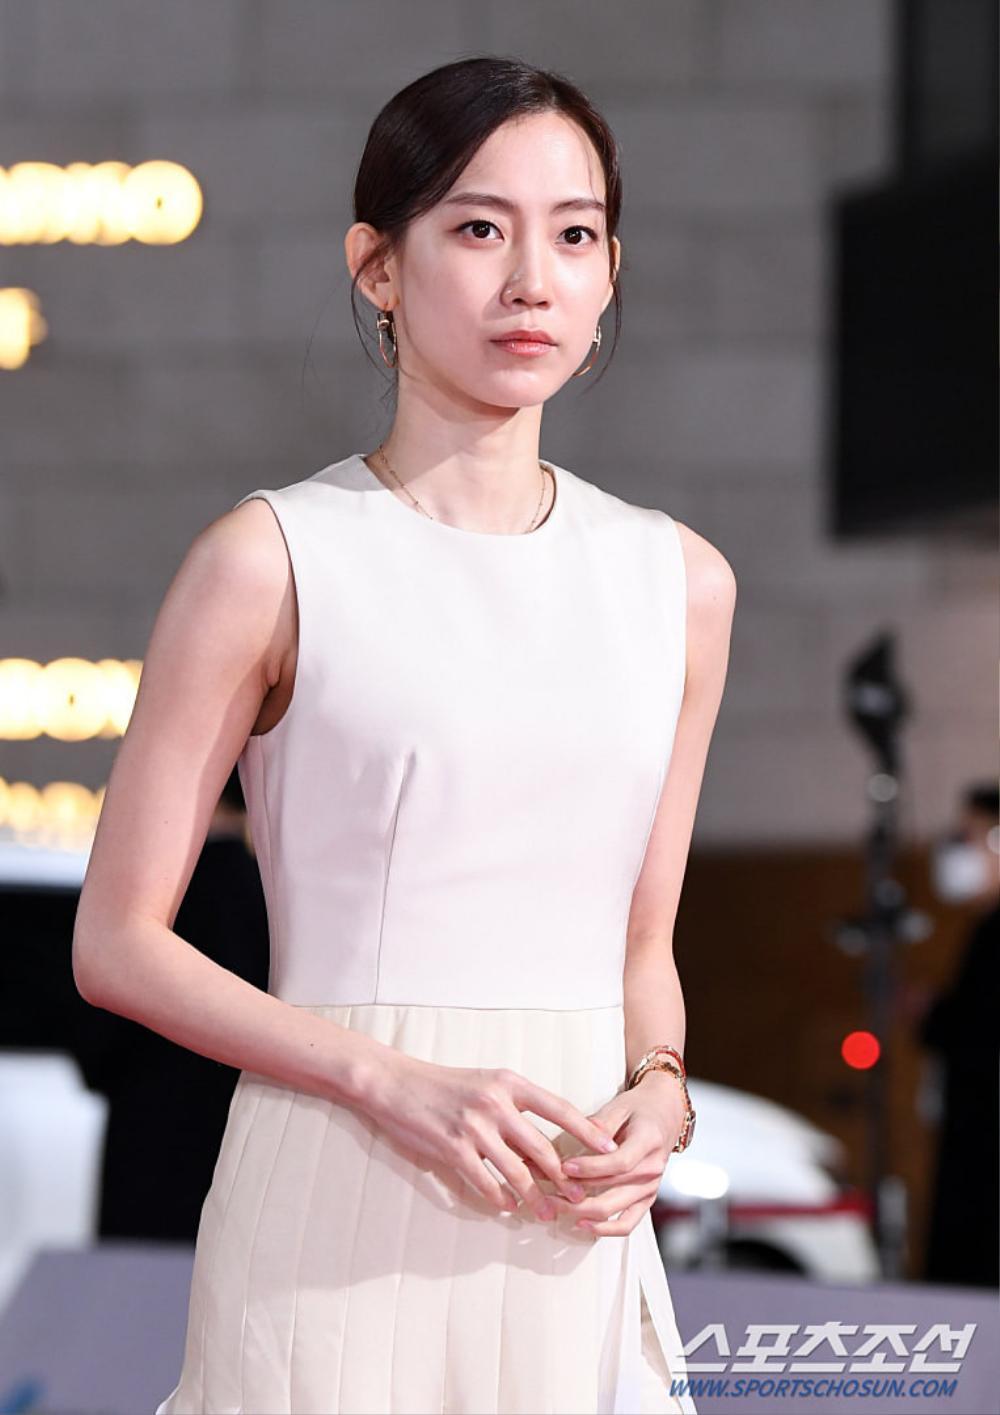 Thảm đỏ 'Rồng xanh 2020': Shin Hye Sun 'cân sắc' Shin Min Ah, Jung Woo Sung - Lee Byung Hun điển trai! Ảnh 48